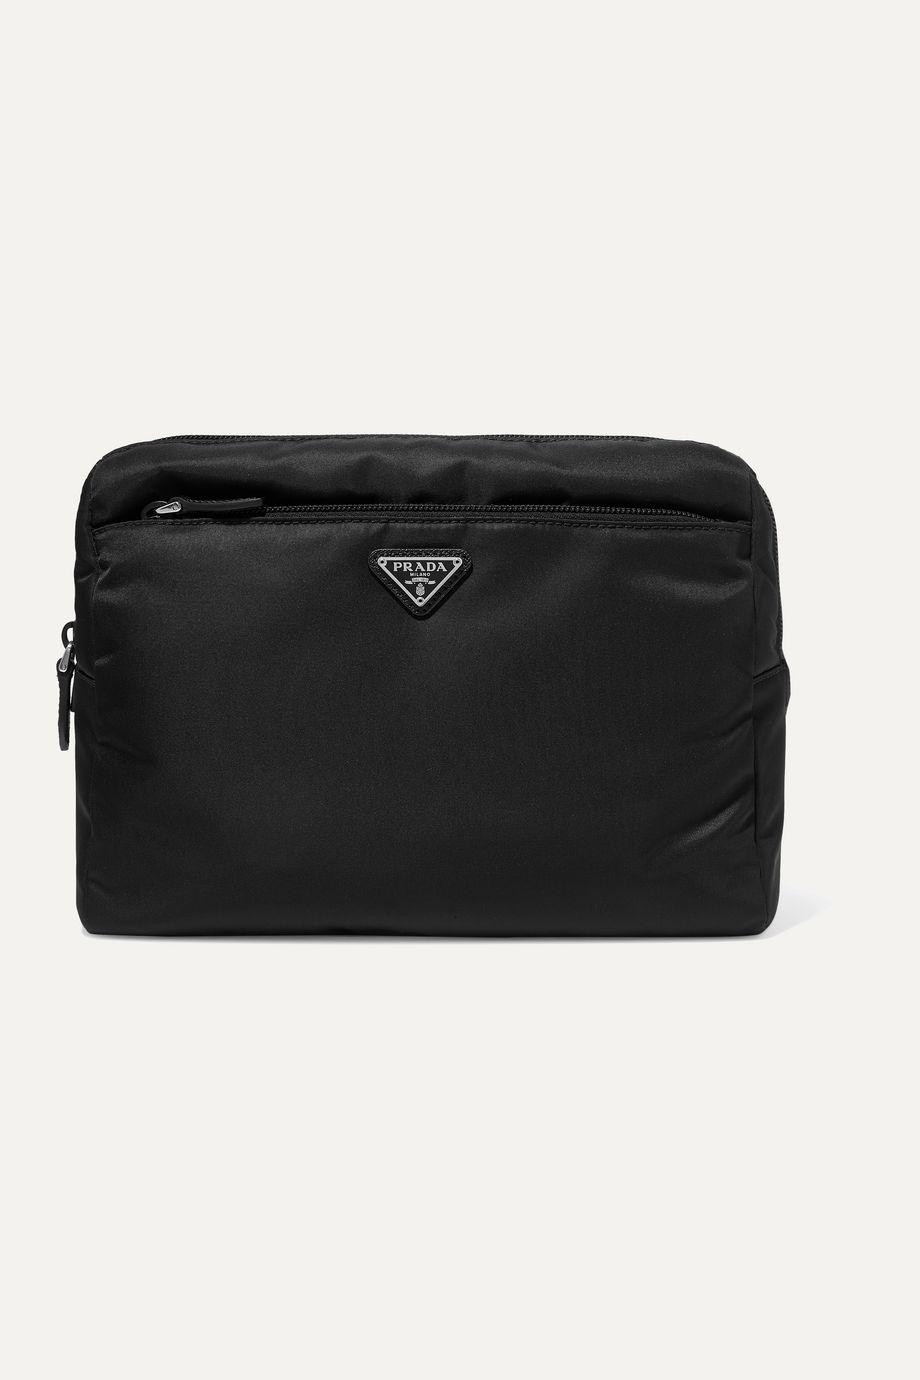 Prada Appliquéd leather-trimmed nylon cosmetics case